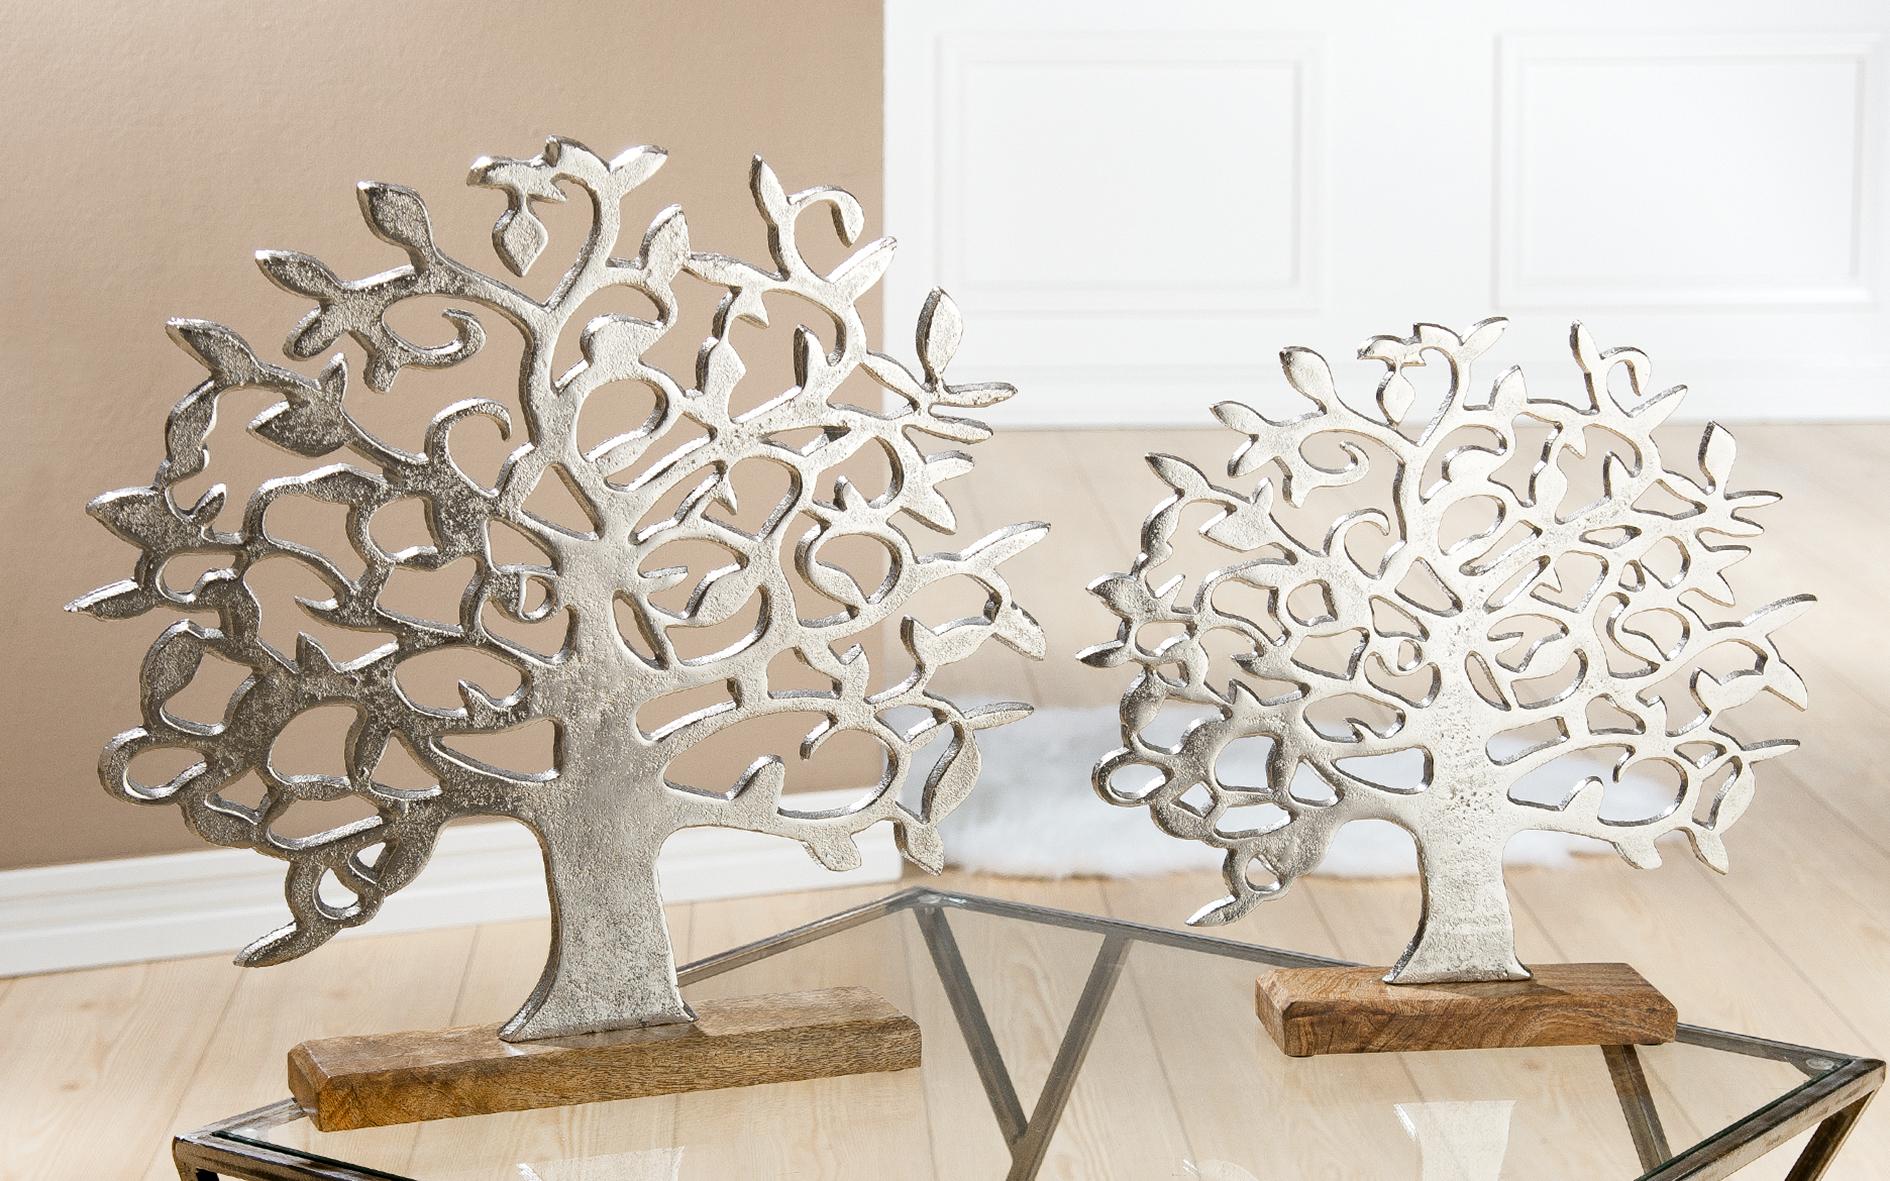 Tischdeko Alu Lebensbaum Auf Holzbase Silber Gilde Living